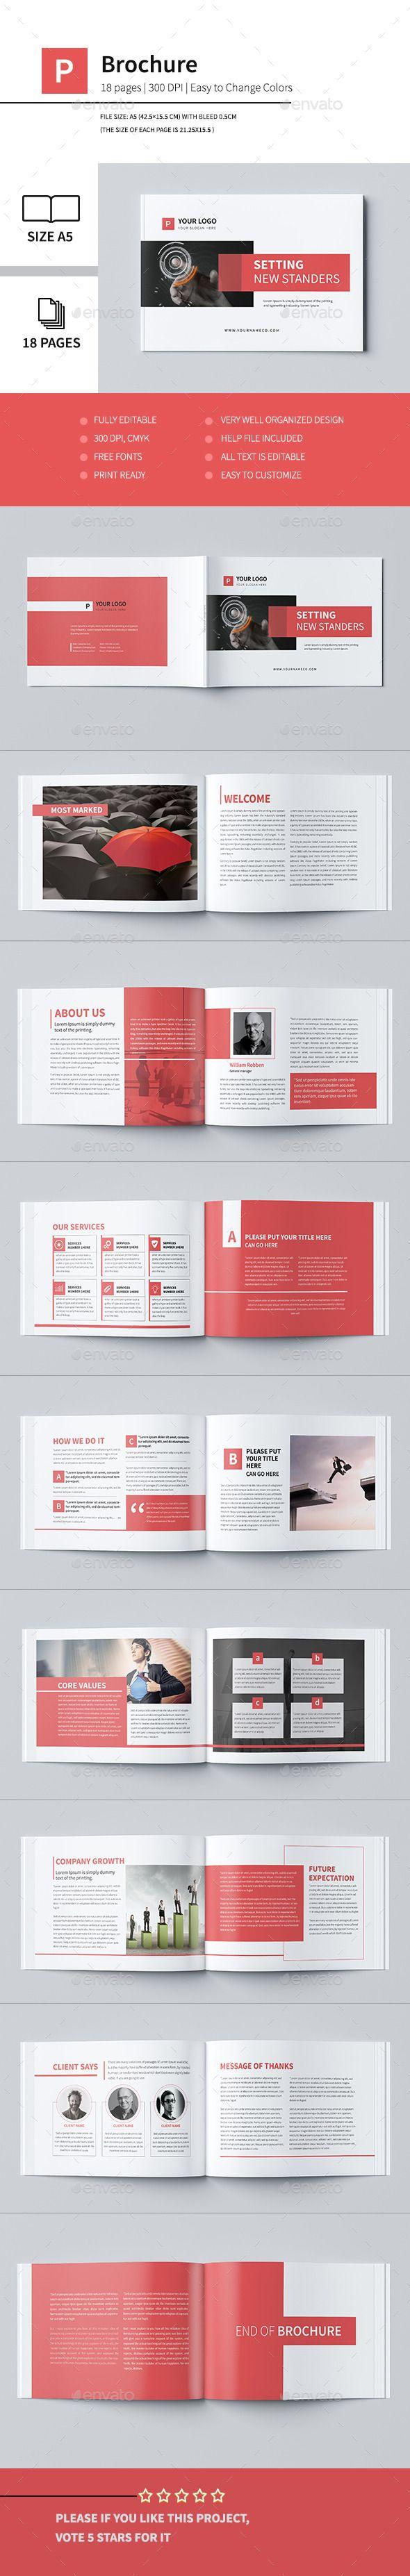 Minimal Business Brochure Template #brochure #design Download: graphicriver.net/...